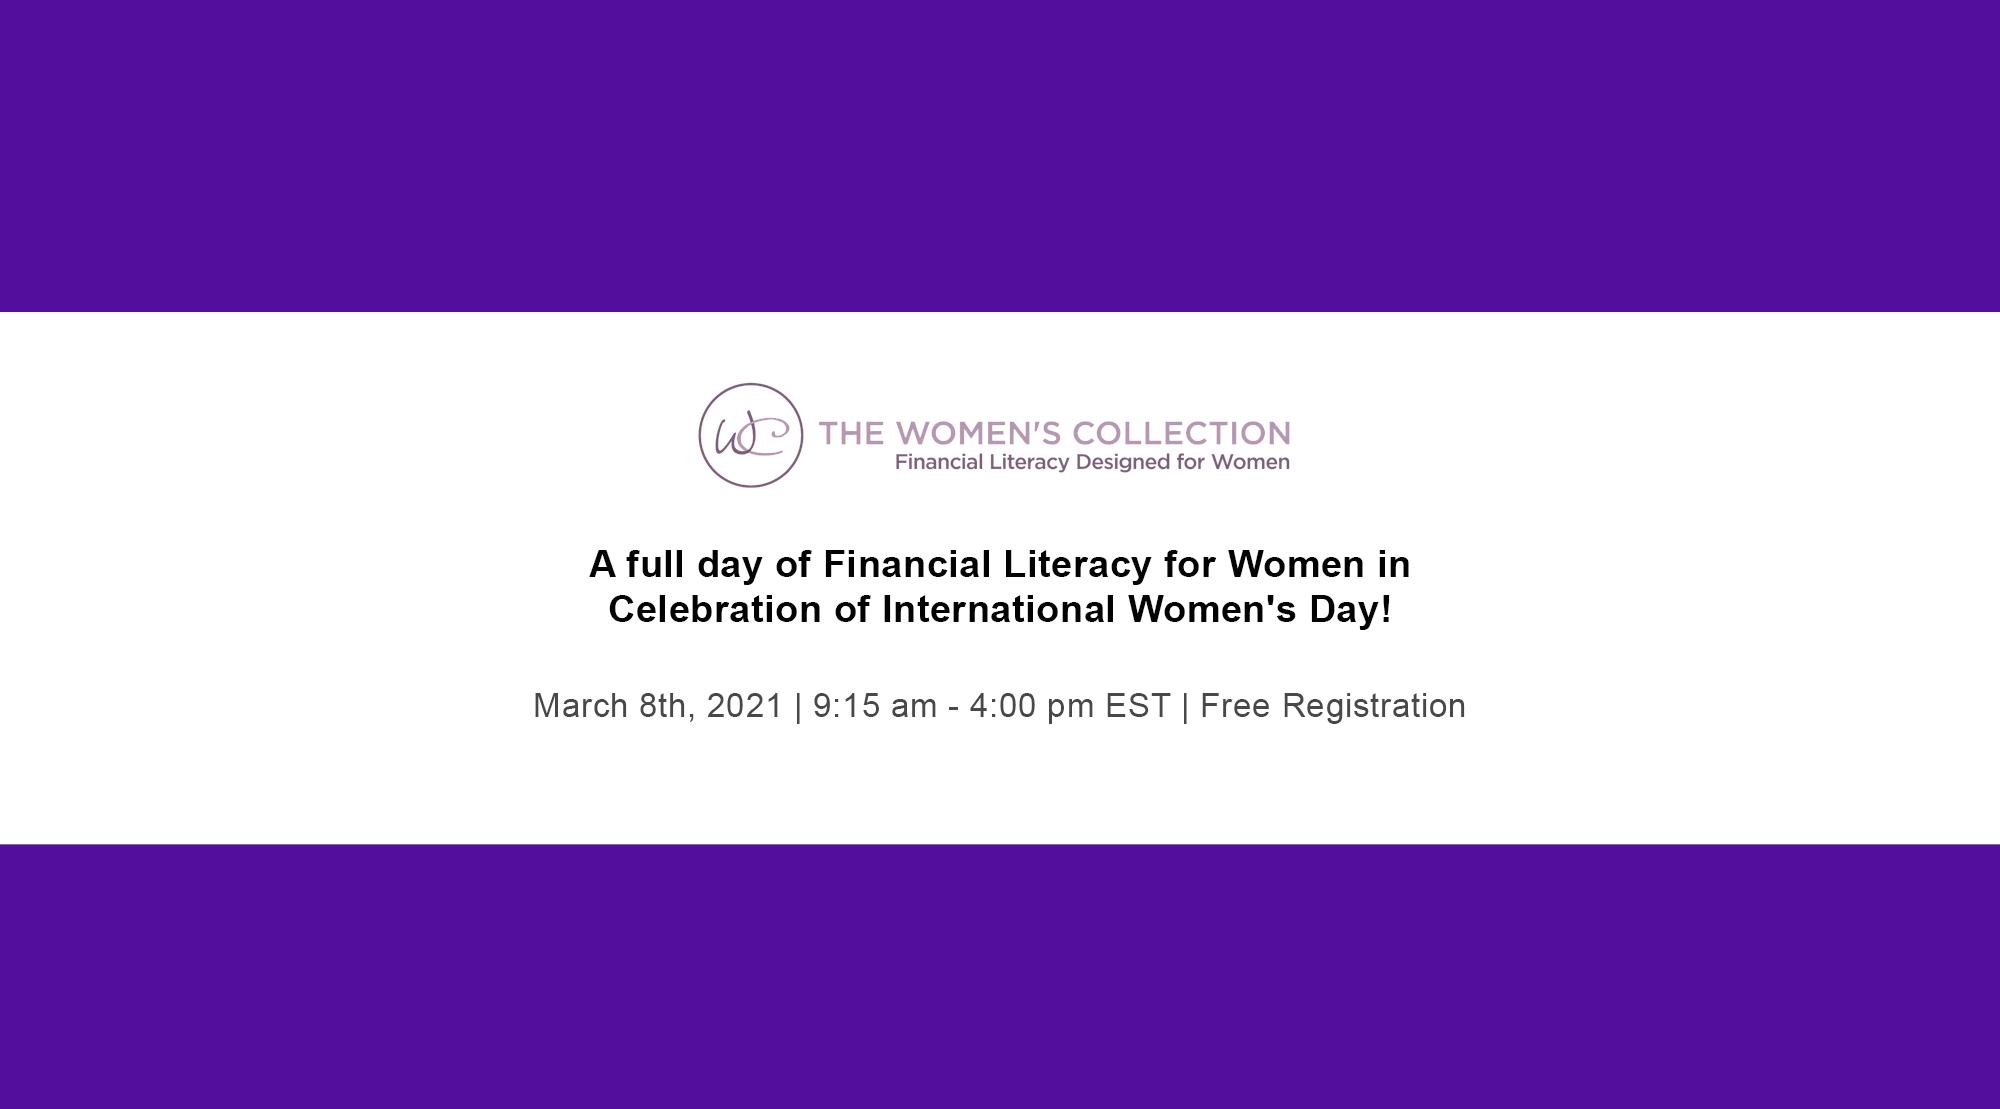 A full day of Financial Literacy for Women in Celebration of International Women's Day!